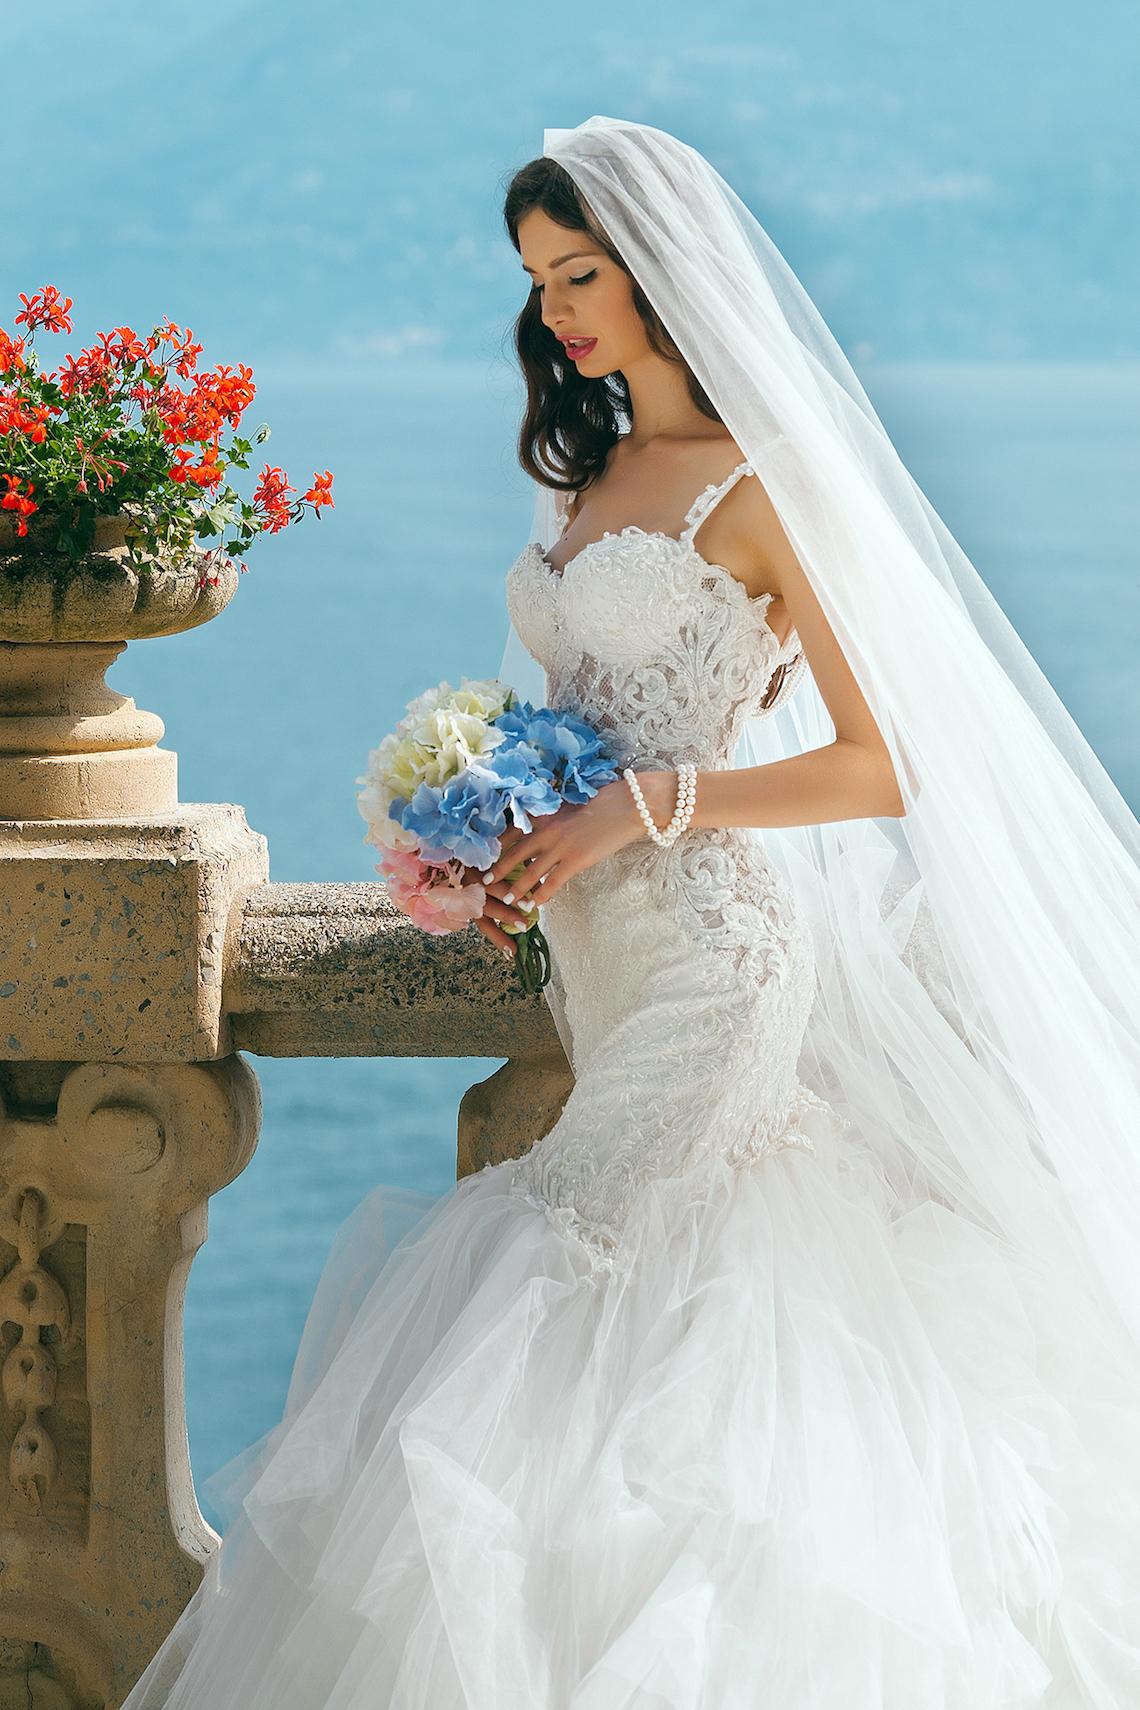 Destination-Wedding-in-Lake-Como-by-Orlova-Maria-and-WeddItaly-25